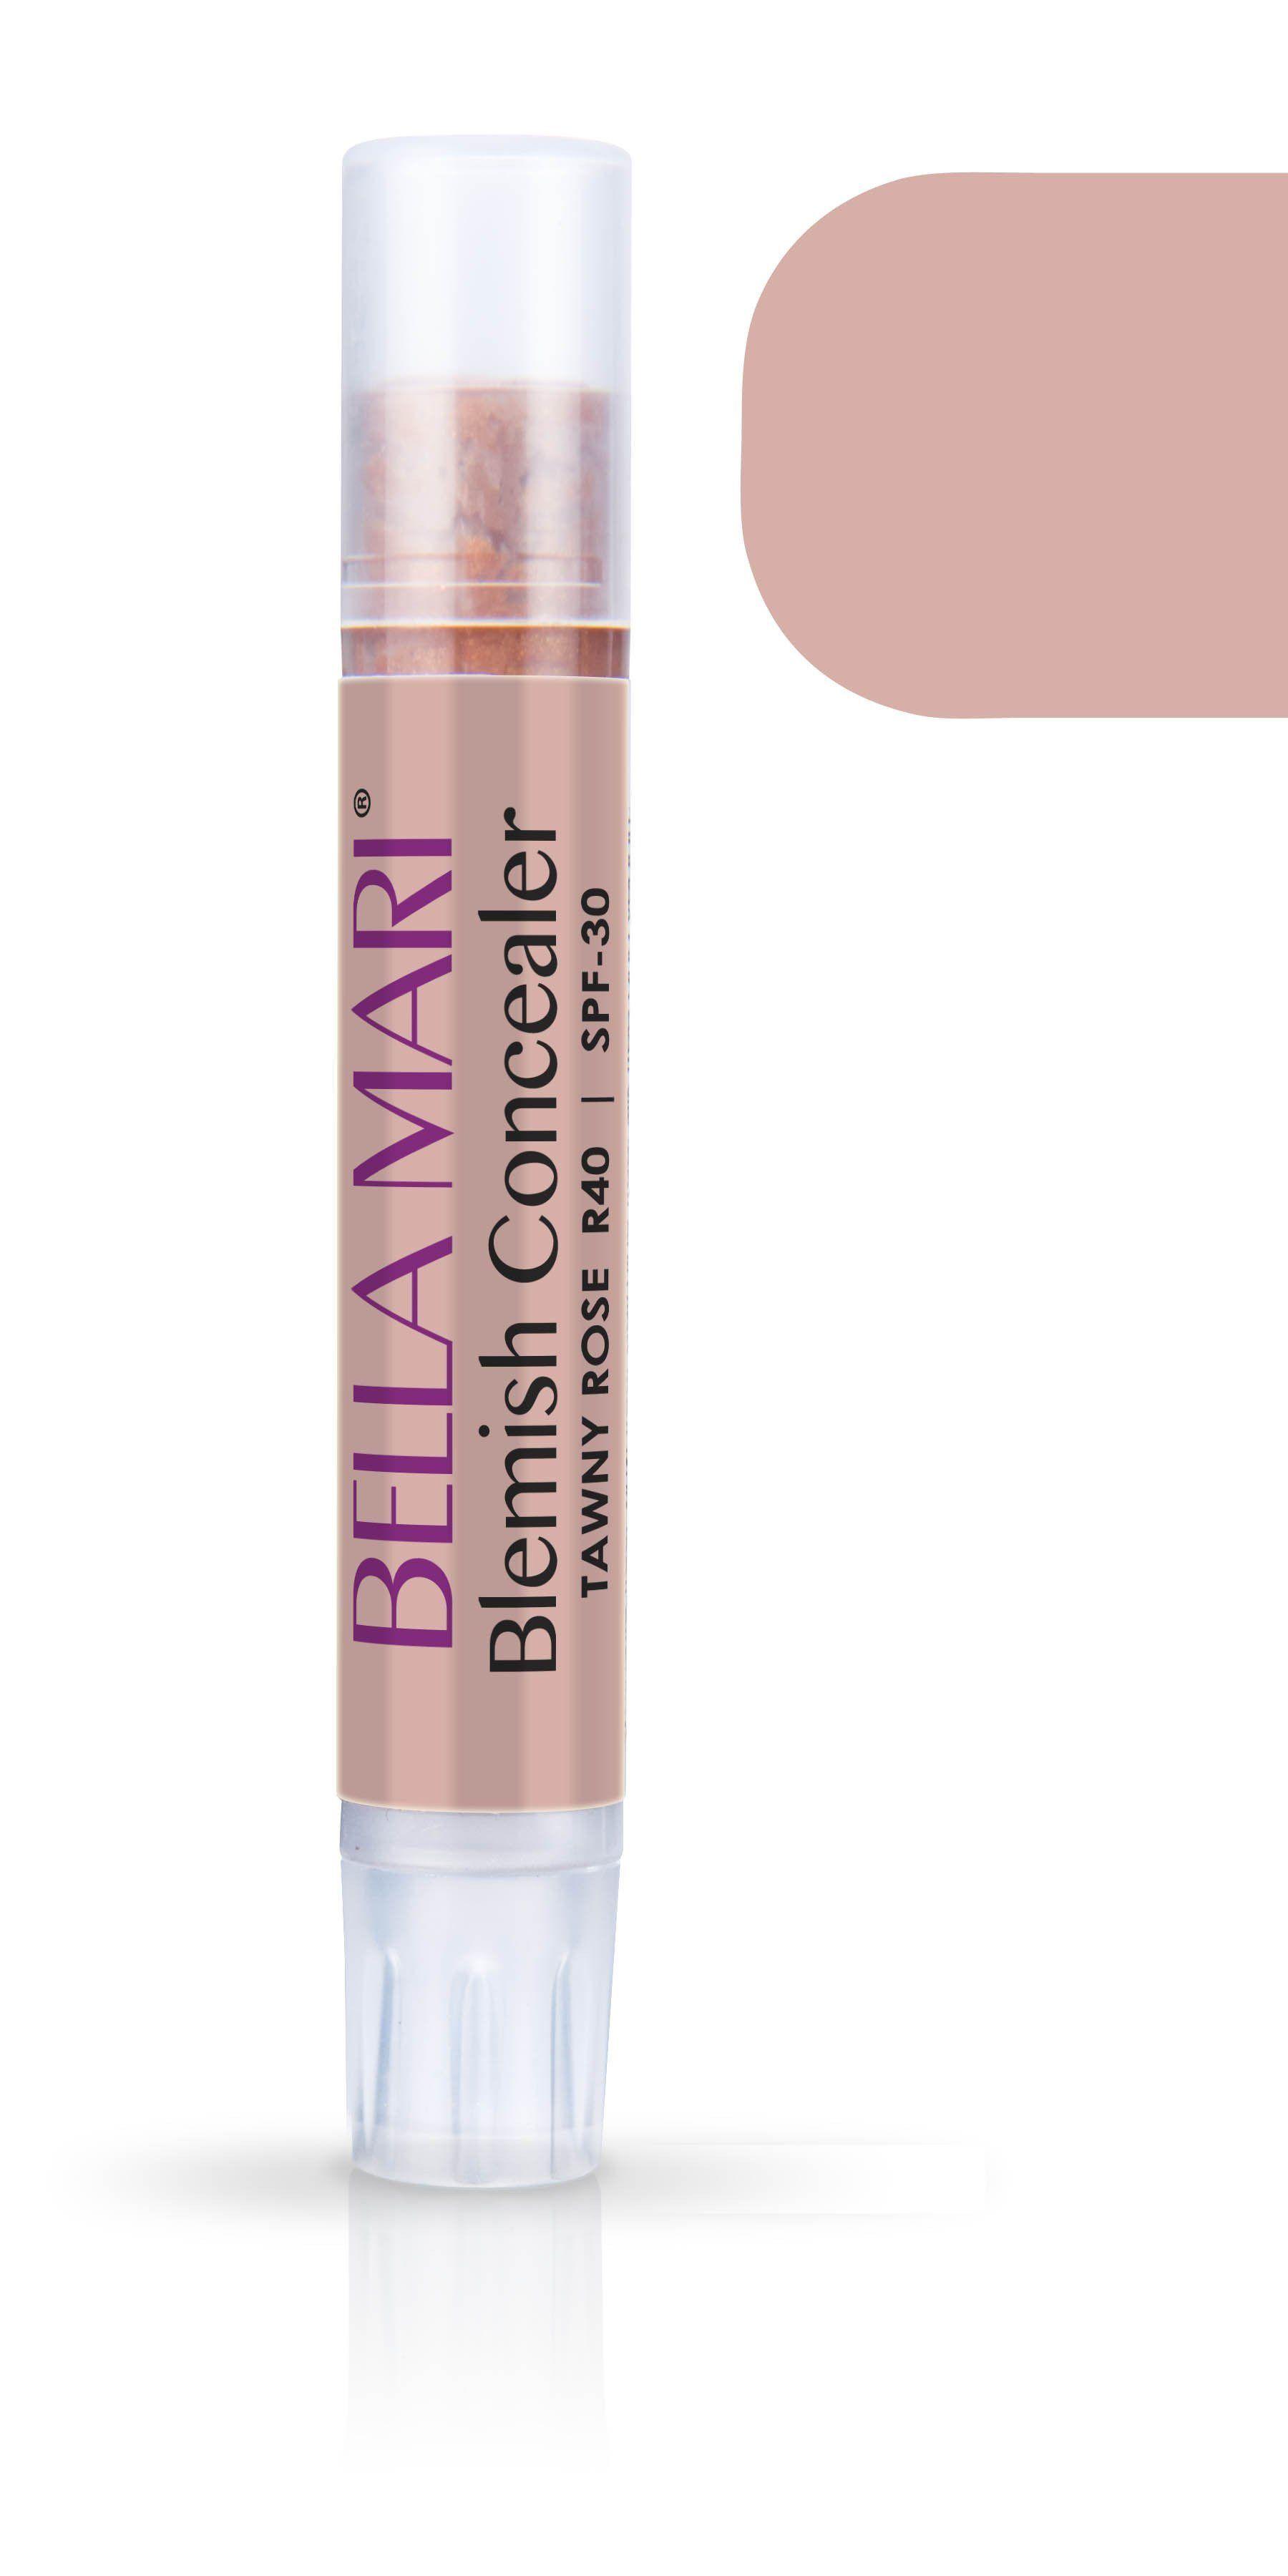 Bella Mari Natural Blemish Concealer Stick; 0.1floz